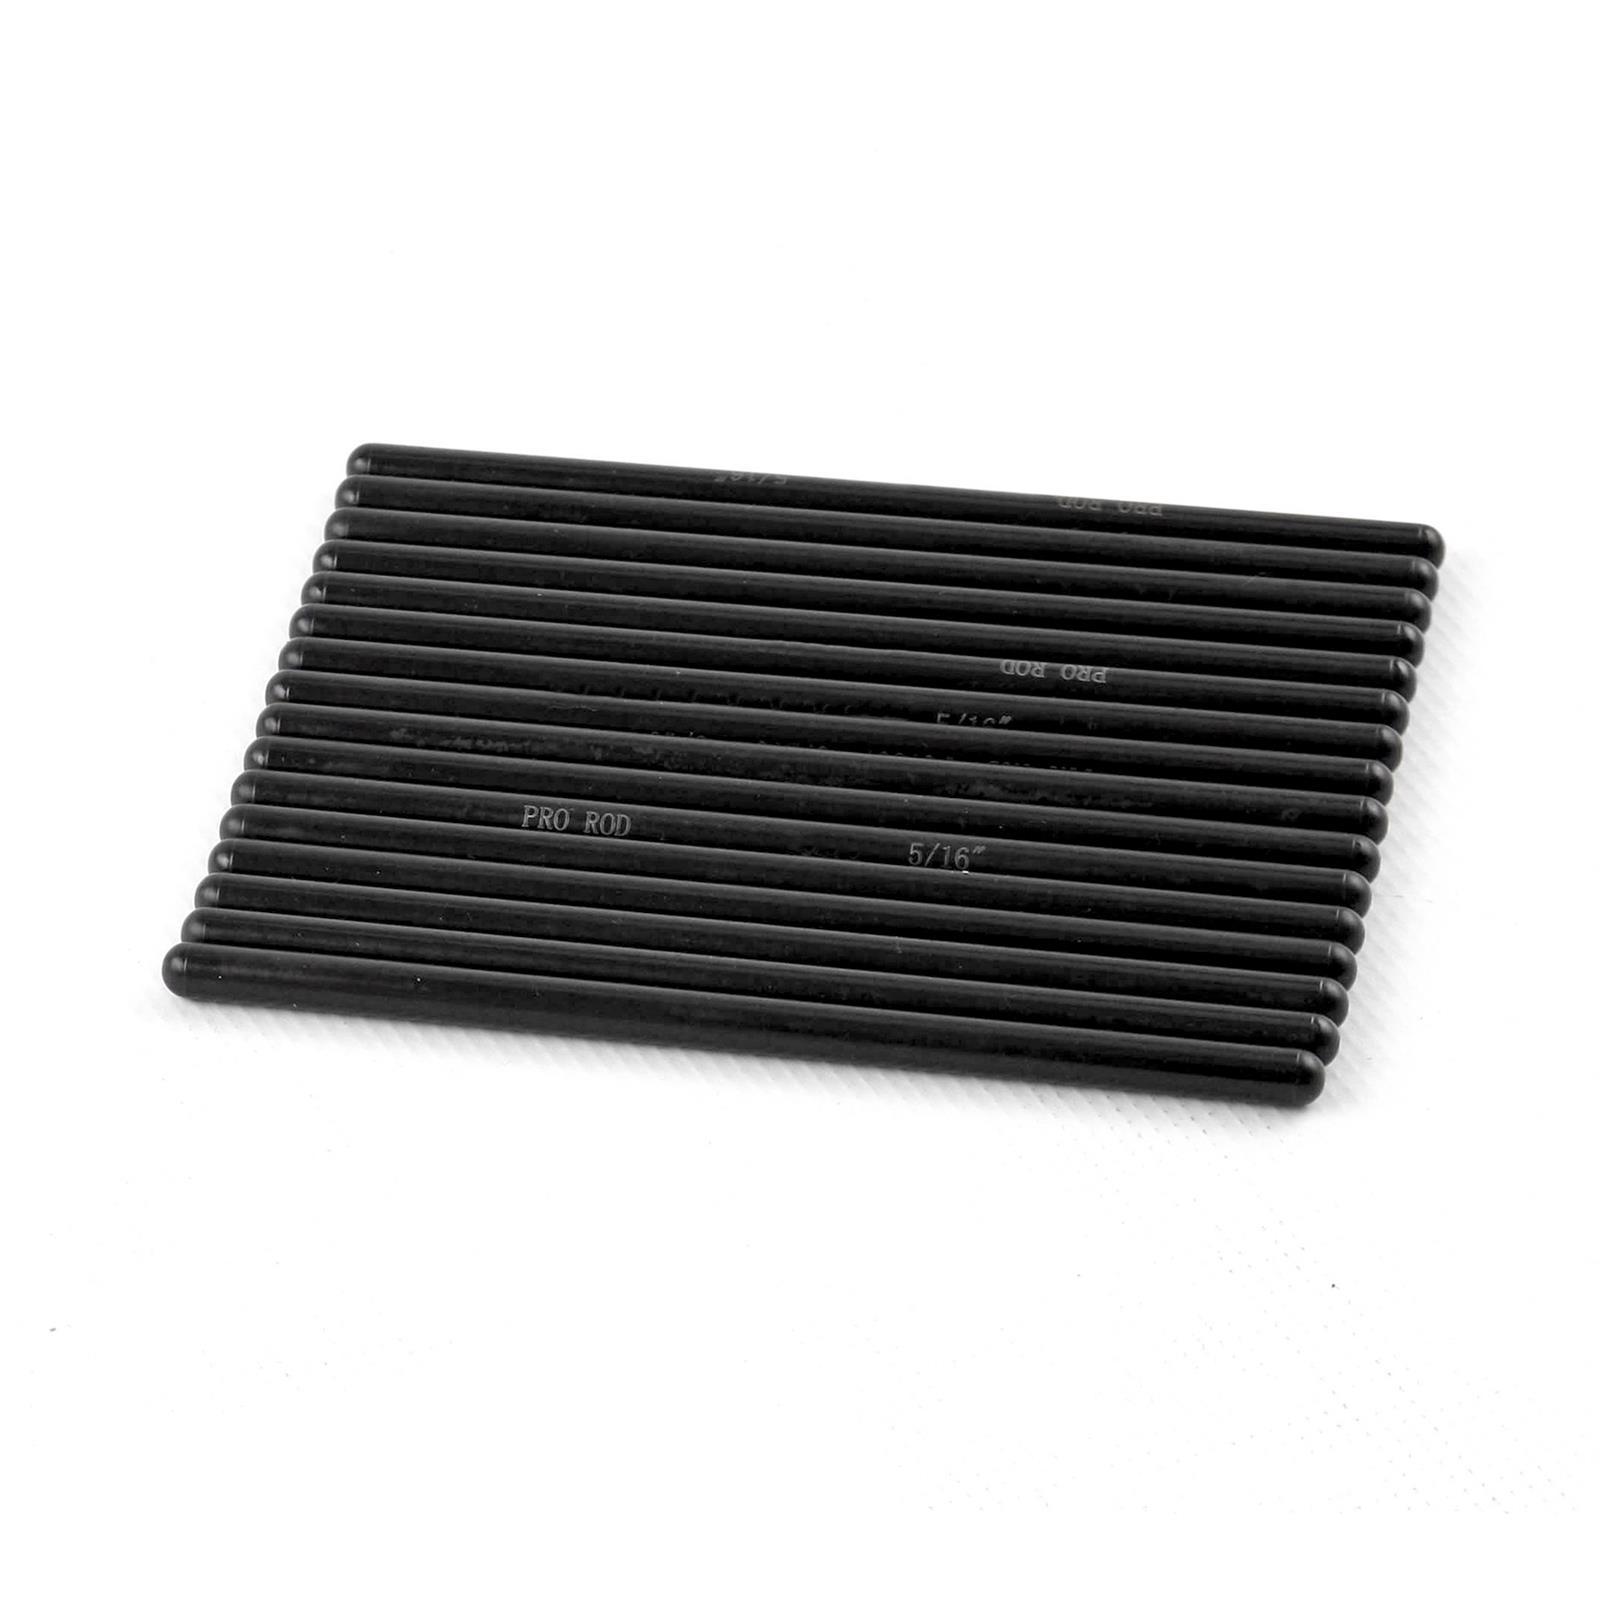 Procomp Electronics One-Piece Pushrods PCE254-1016